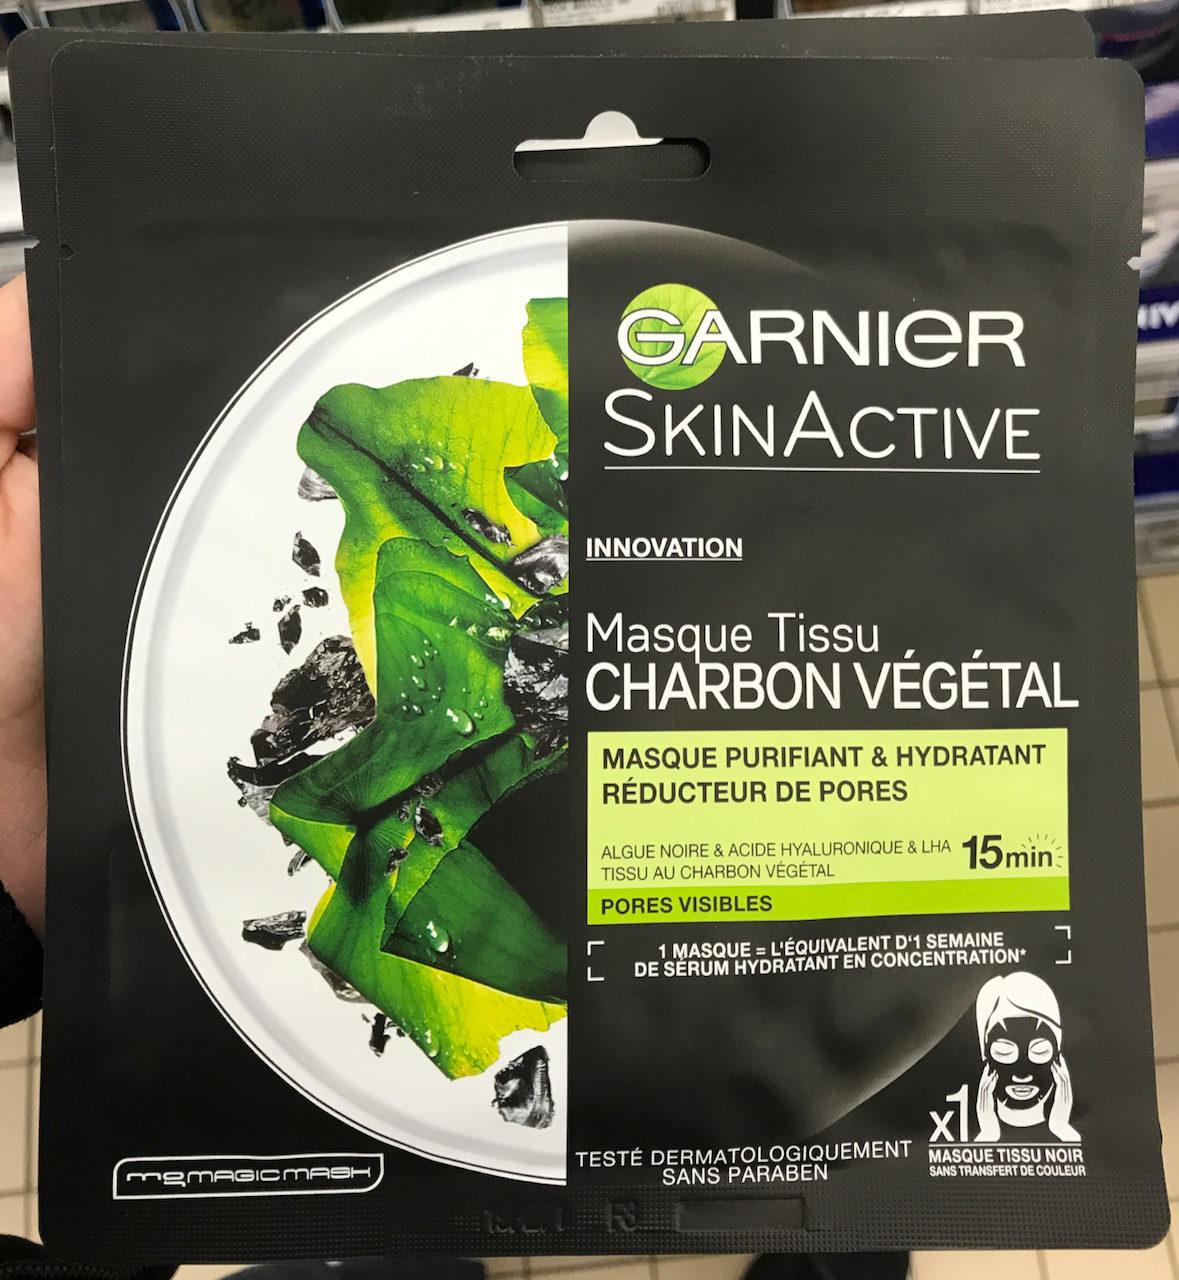 Skin Active Masque Tissu Charbon Végétal - Product - fr